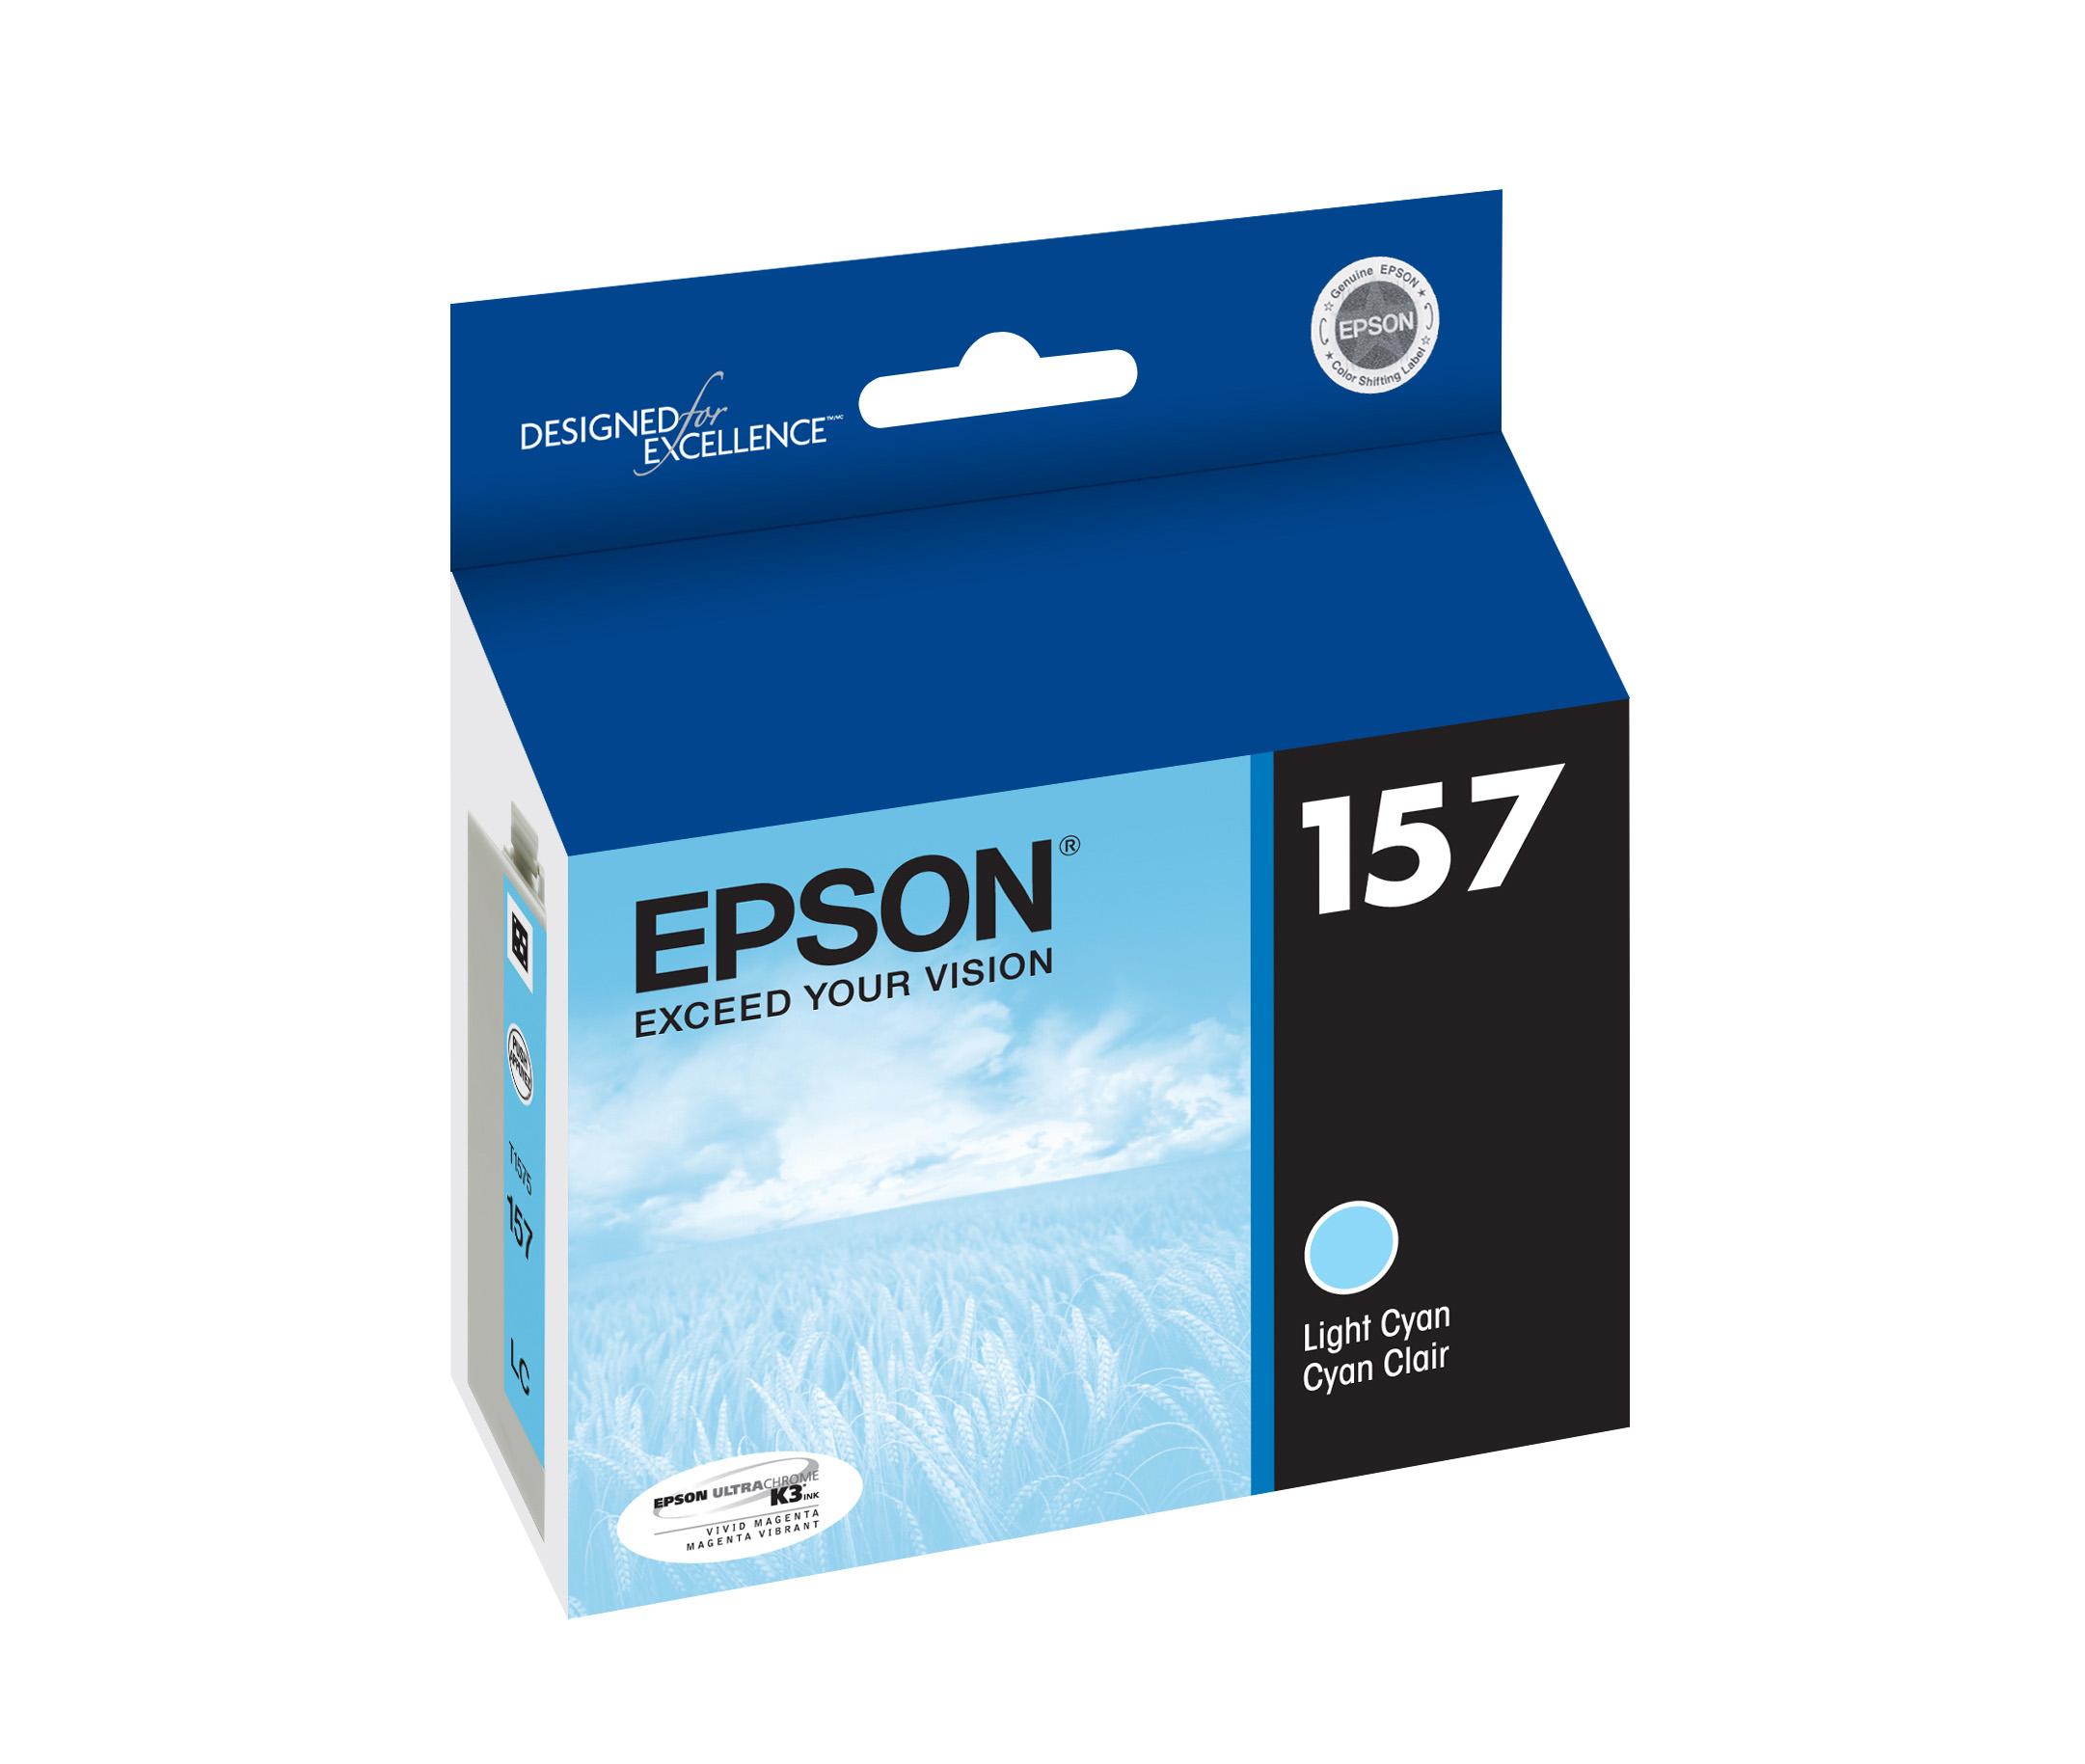 Epson R3000 Light Cyan Ink (T157520)